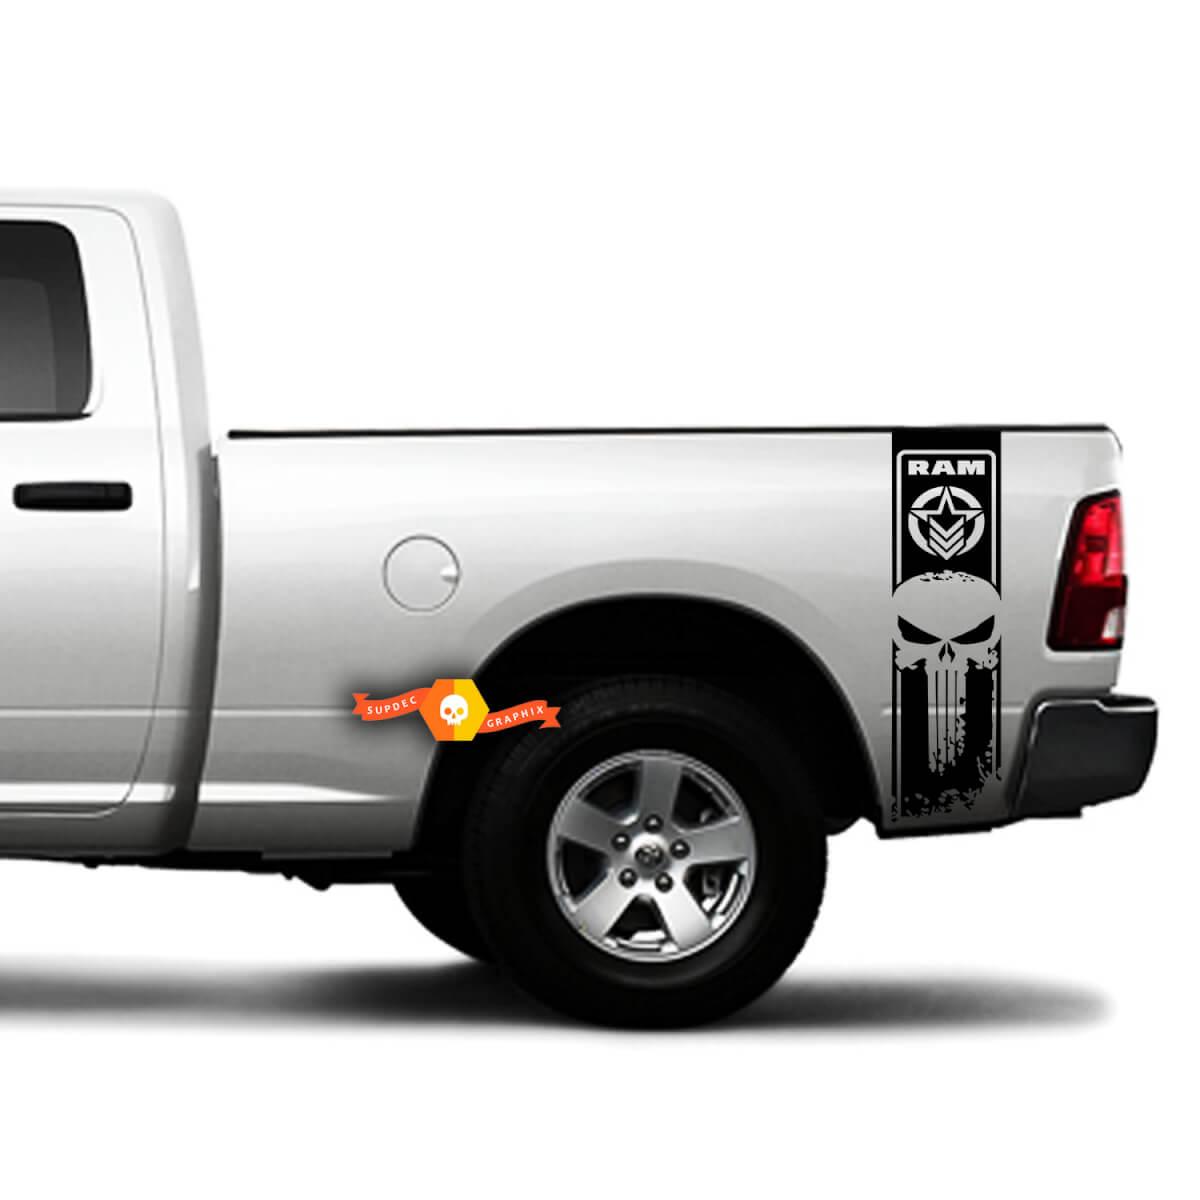 Dodge Ram Punisher Star 1500 2500 3500 Hemi 4x4 Aufkleber Truck Vinyl Stickes